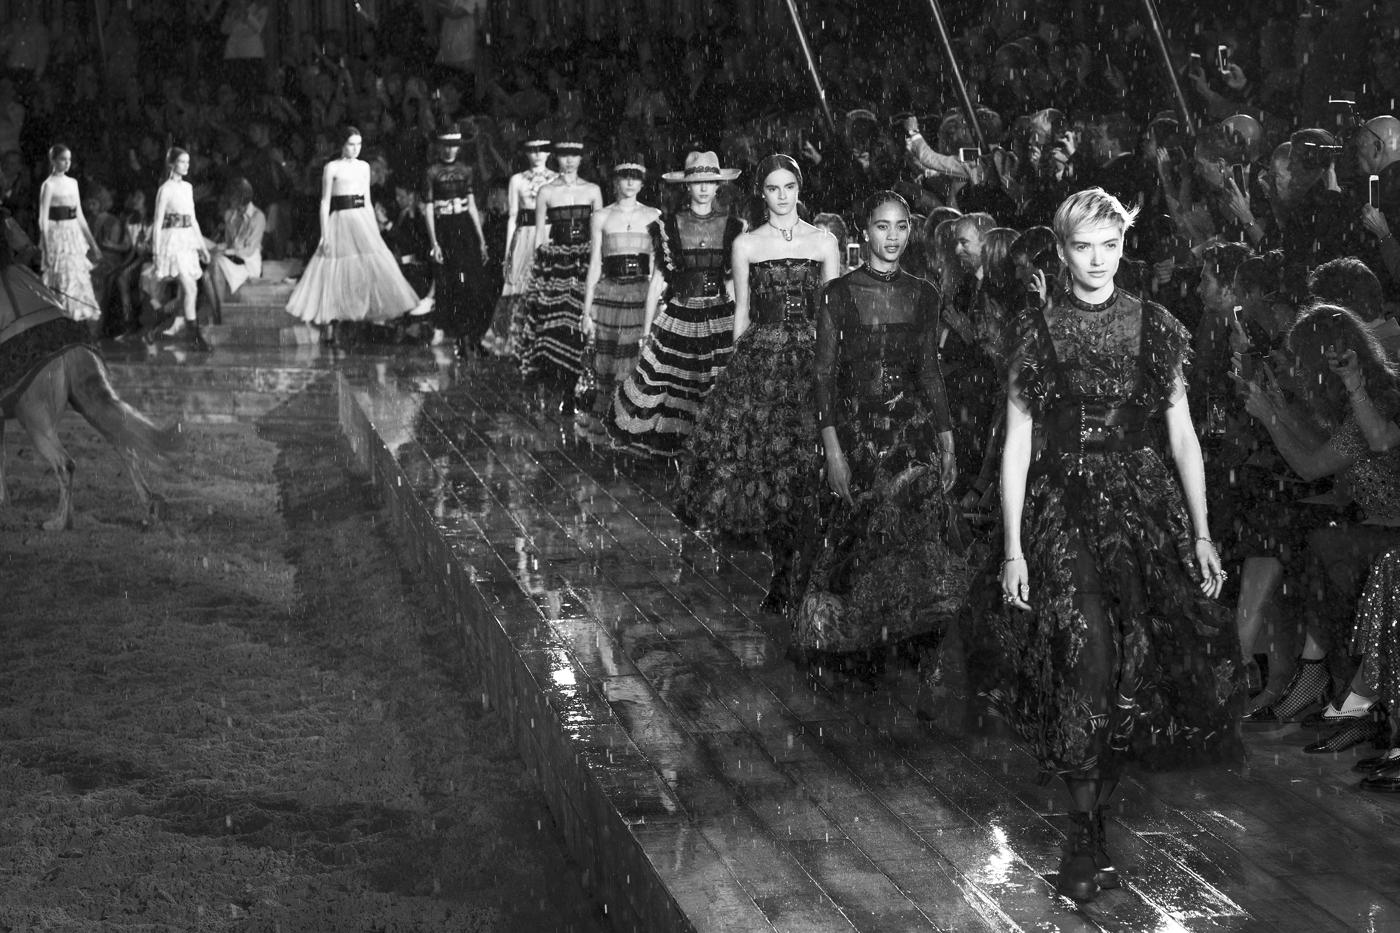 Dior Cruise '18 Show / 10+ Magazine